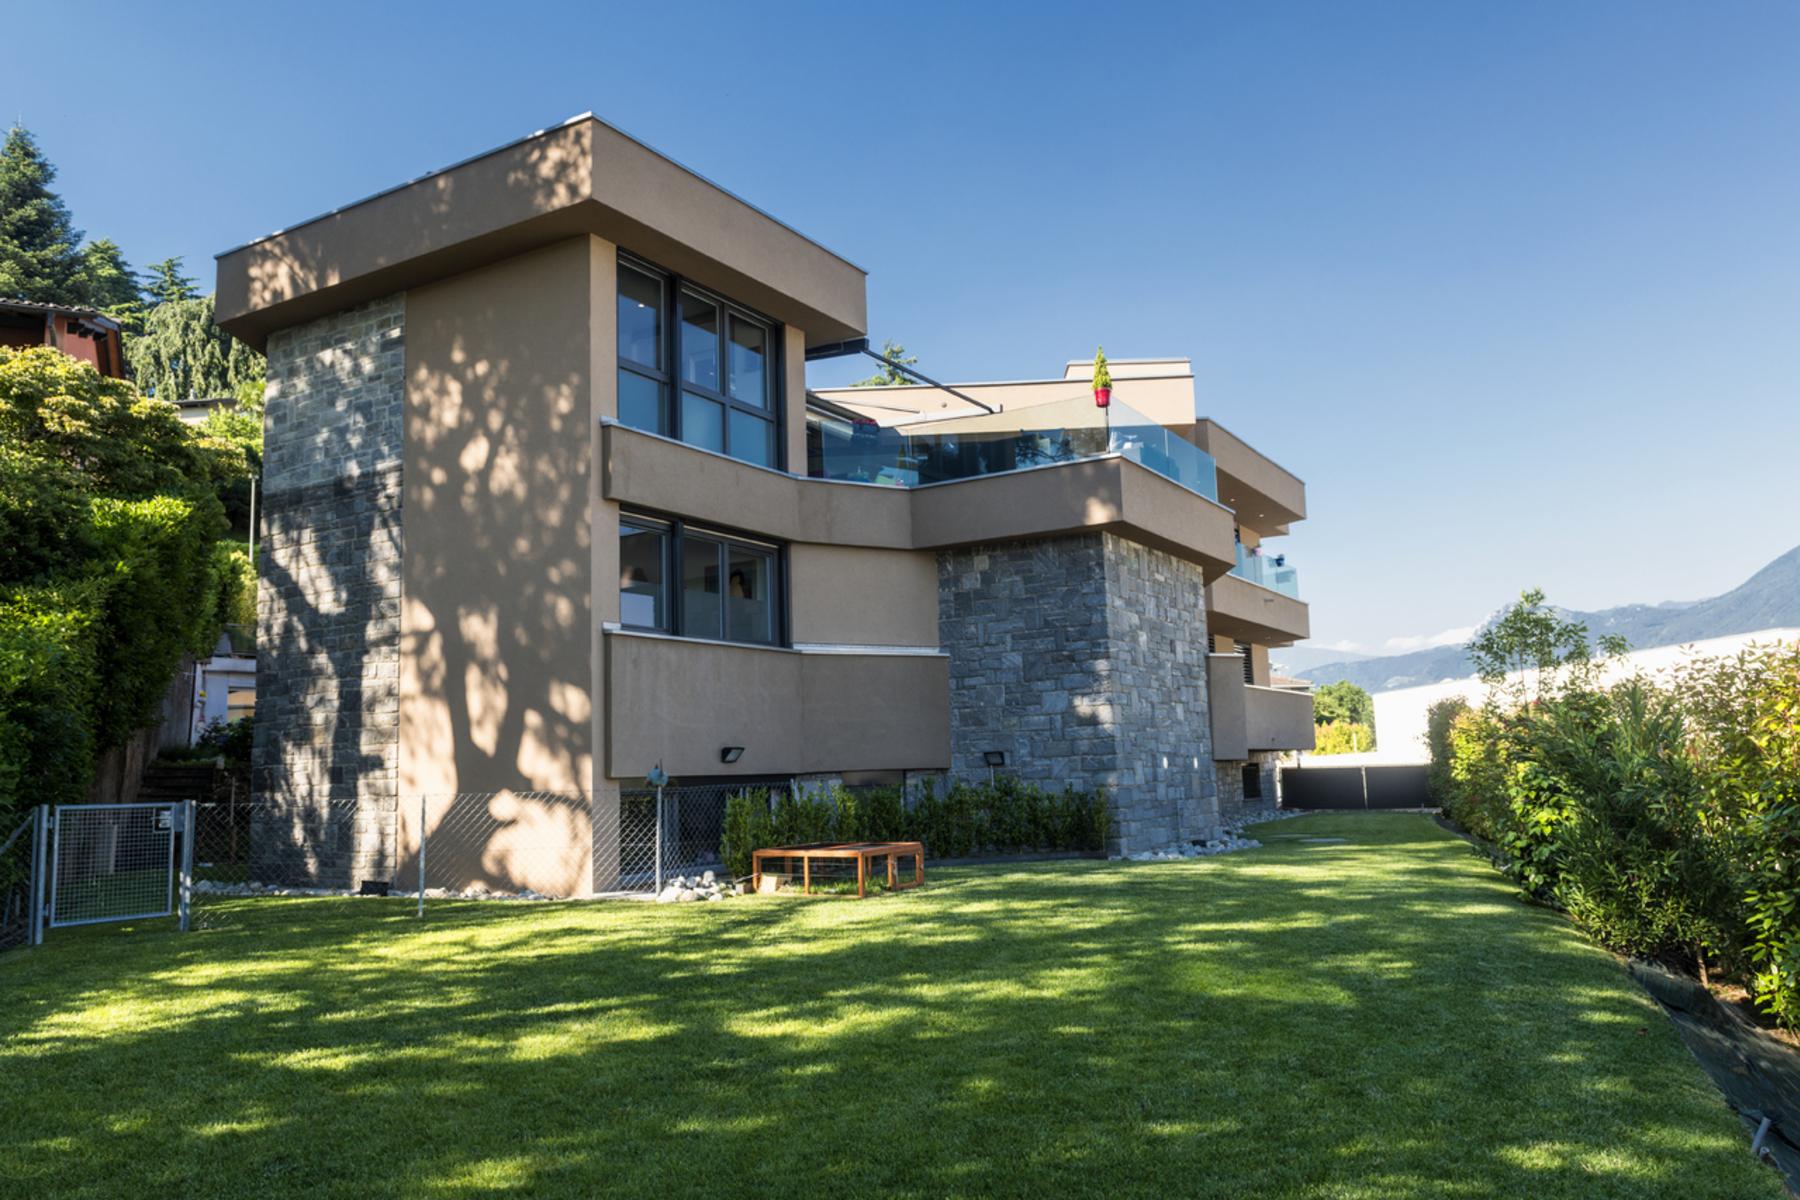 Maison unifamiliale pour l à vendre à Modern villa situated in a raised position Lugano, Lugano, Ticino, 6900 Suisse